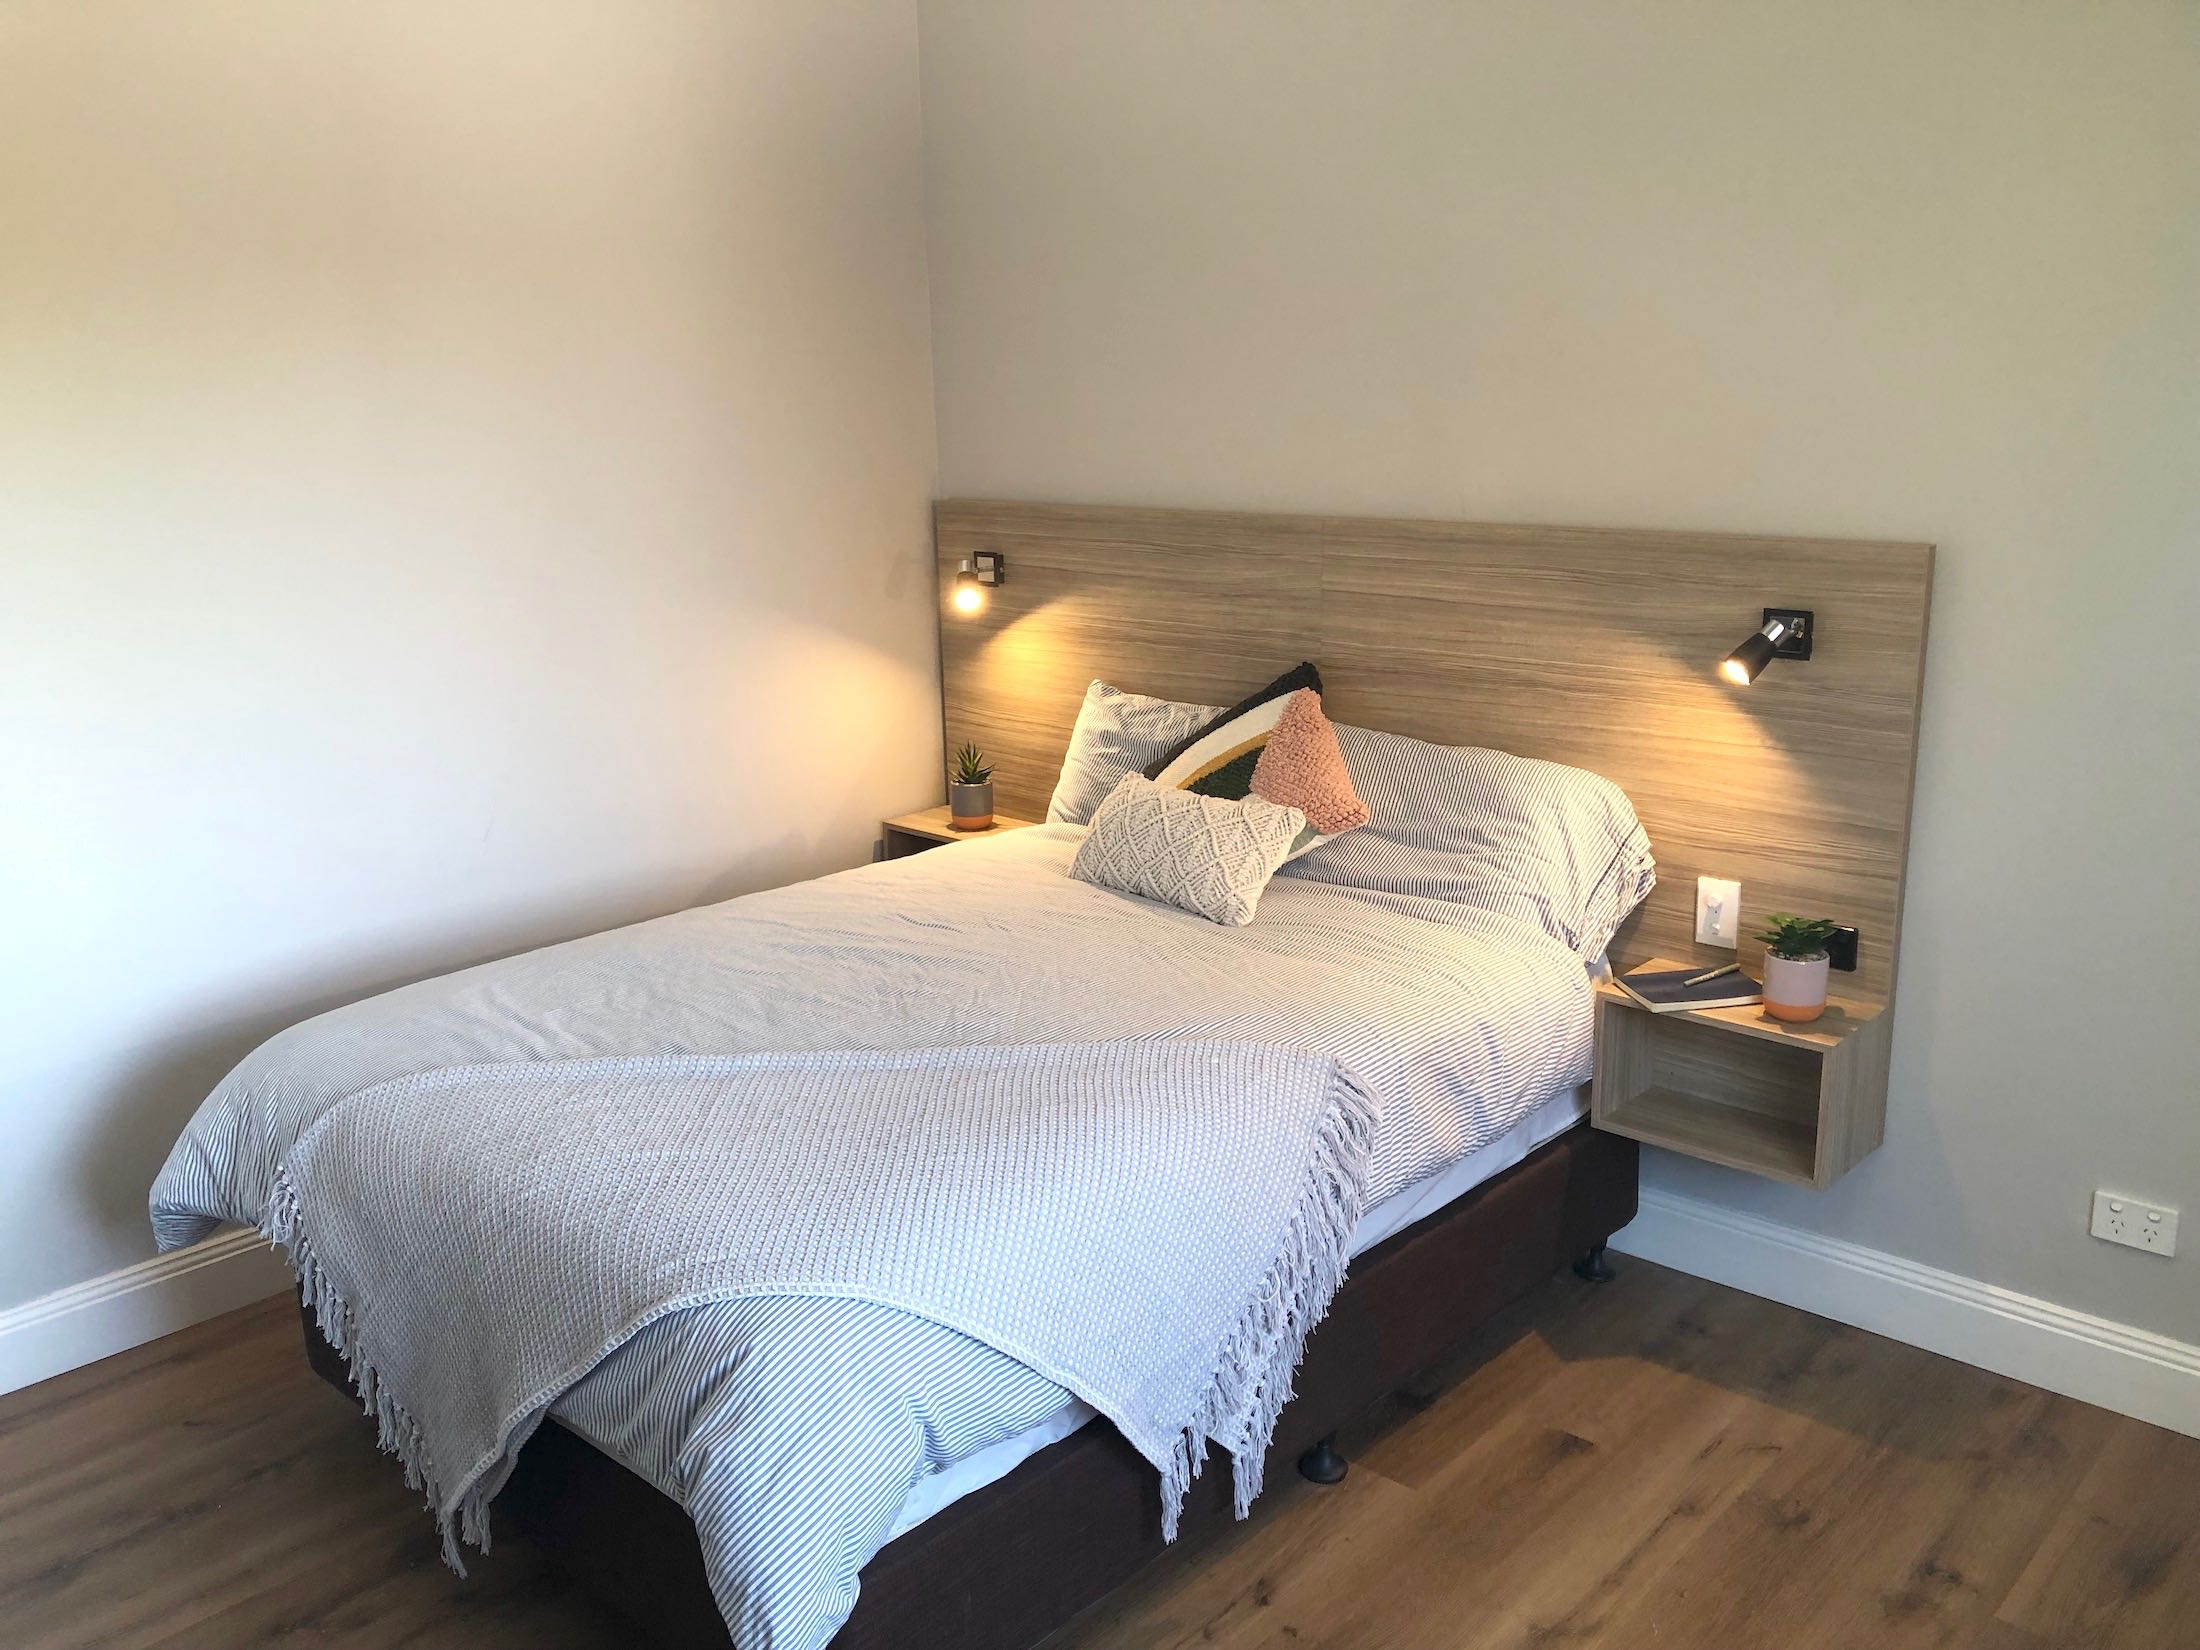 carnarvon-lodge-kirribilli-sydney-accommodation-double-room